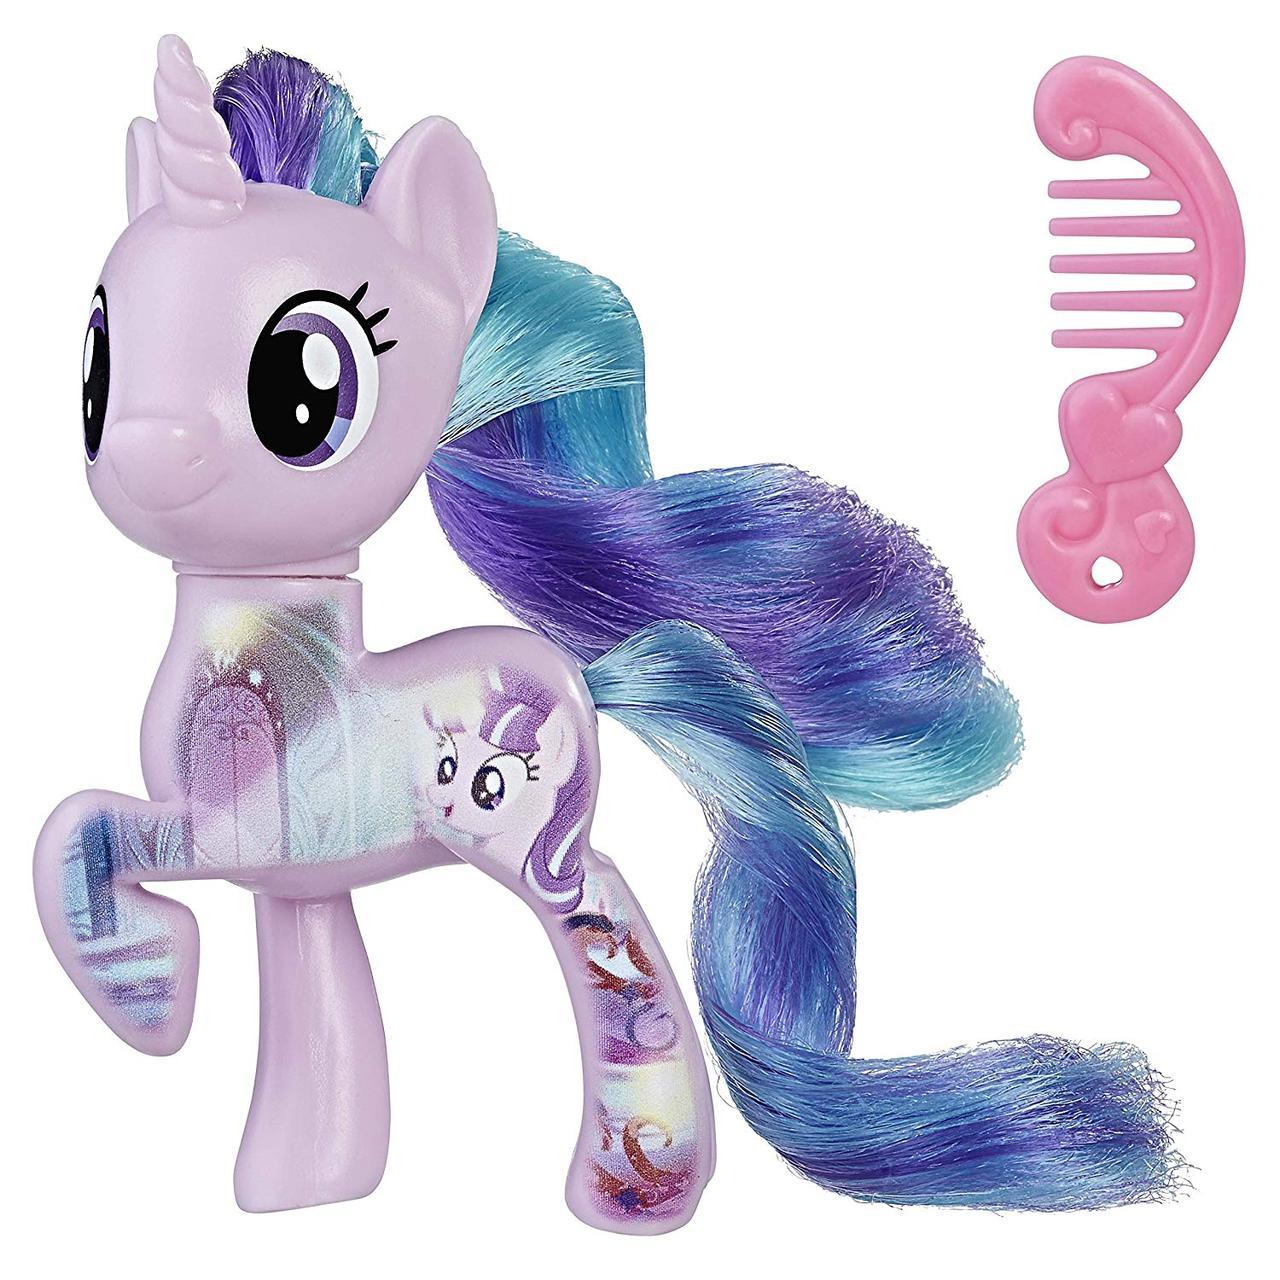 My Little Pony поні Starlight Glimmer серія The Movie (Май Литл Пони Старлайт Глиммер серия Кино)